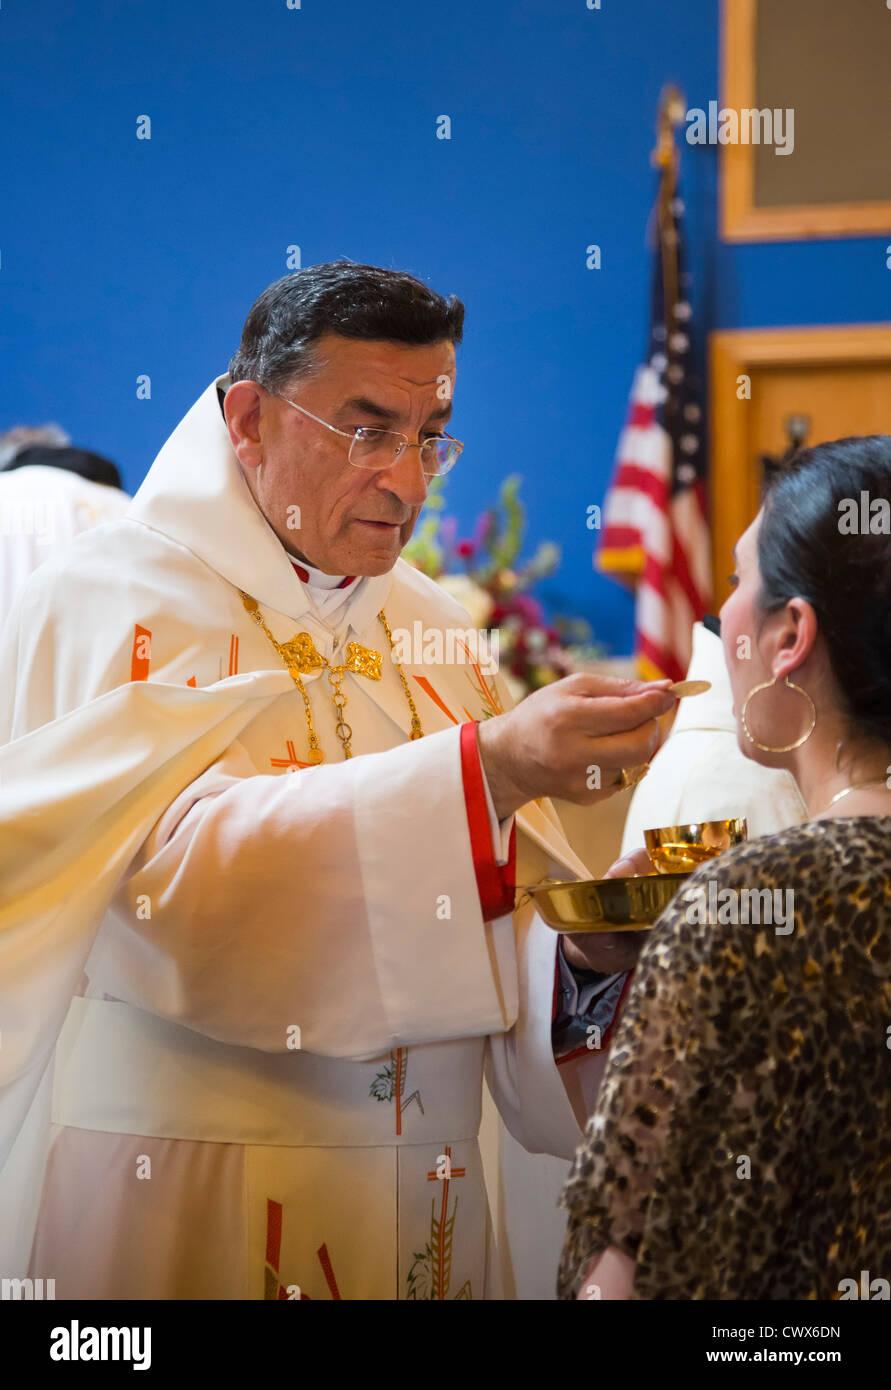 Celebration of the Divine Liturgy at St. Sharbel Maronite Catholic Church - Stock Image